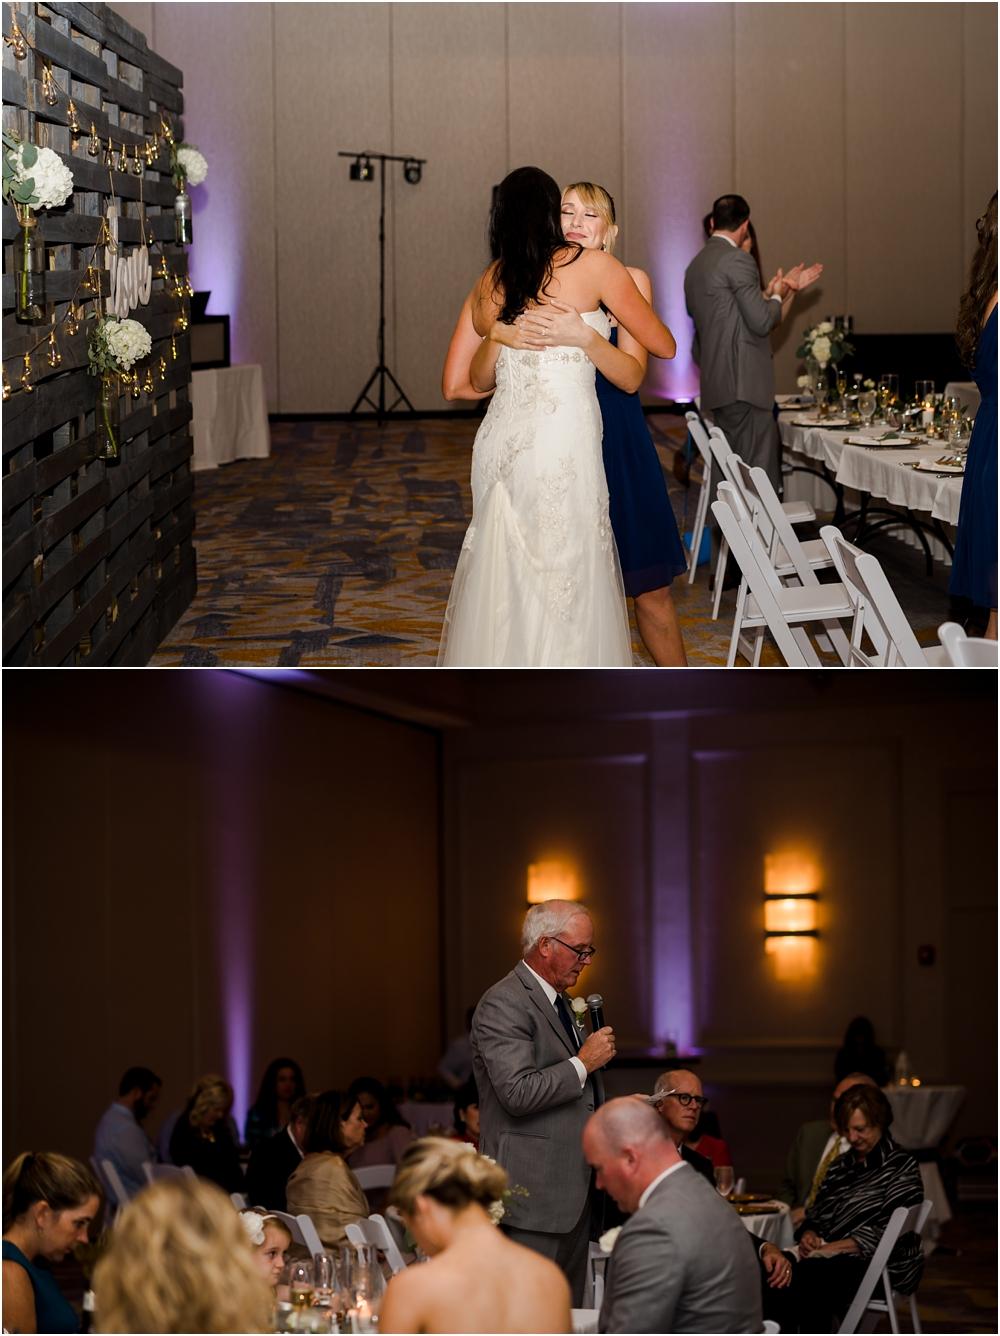 quinn-bay-point-sheraton-florida-wedding-photographer-kiersten-grant-104.jpg